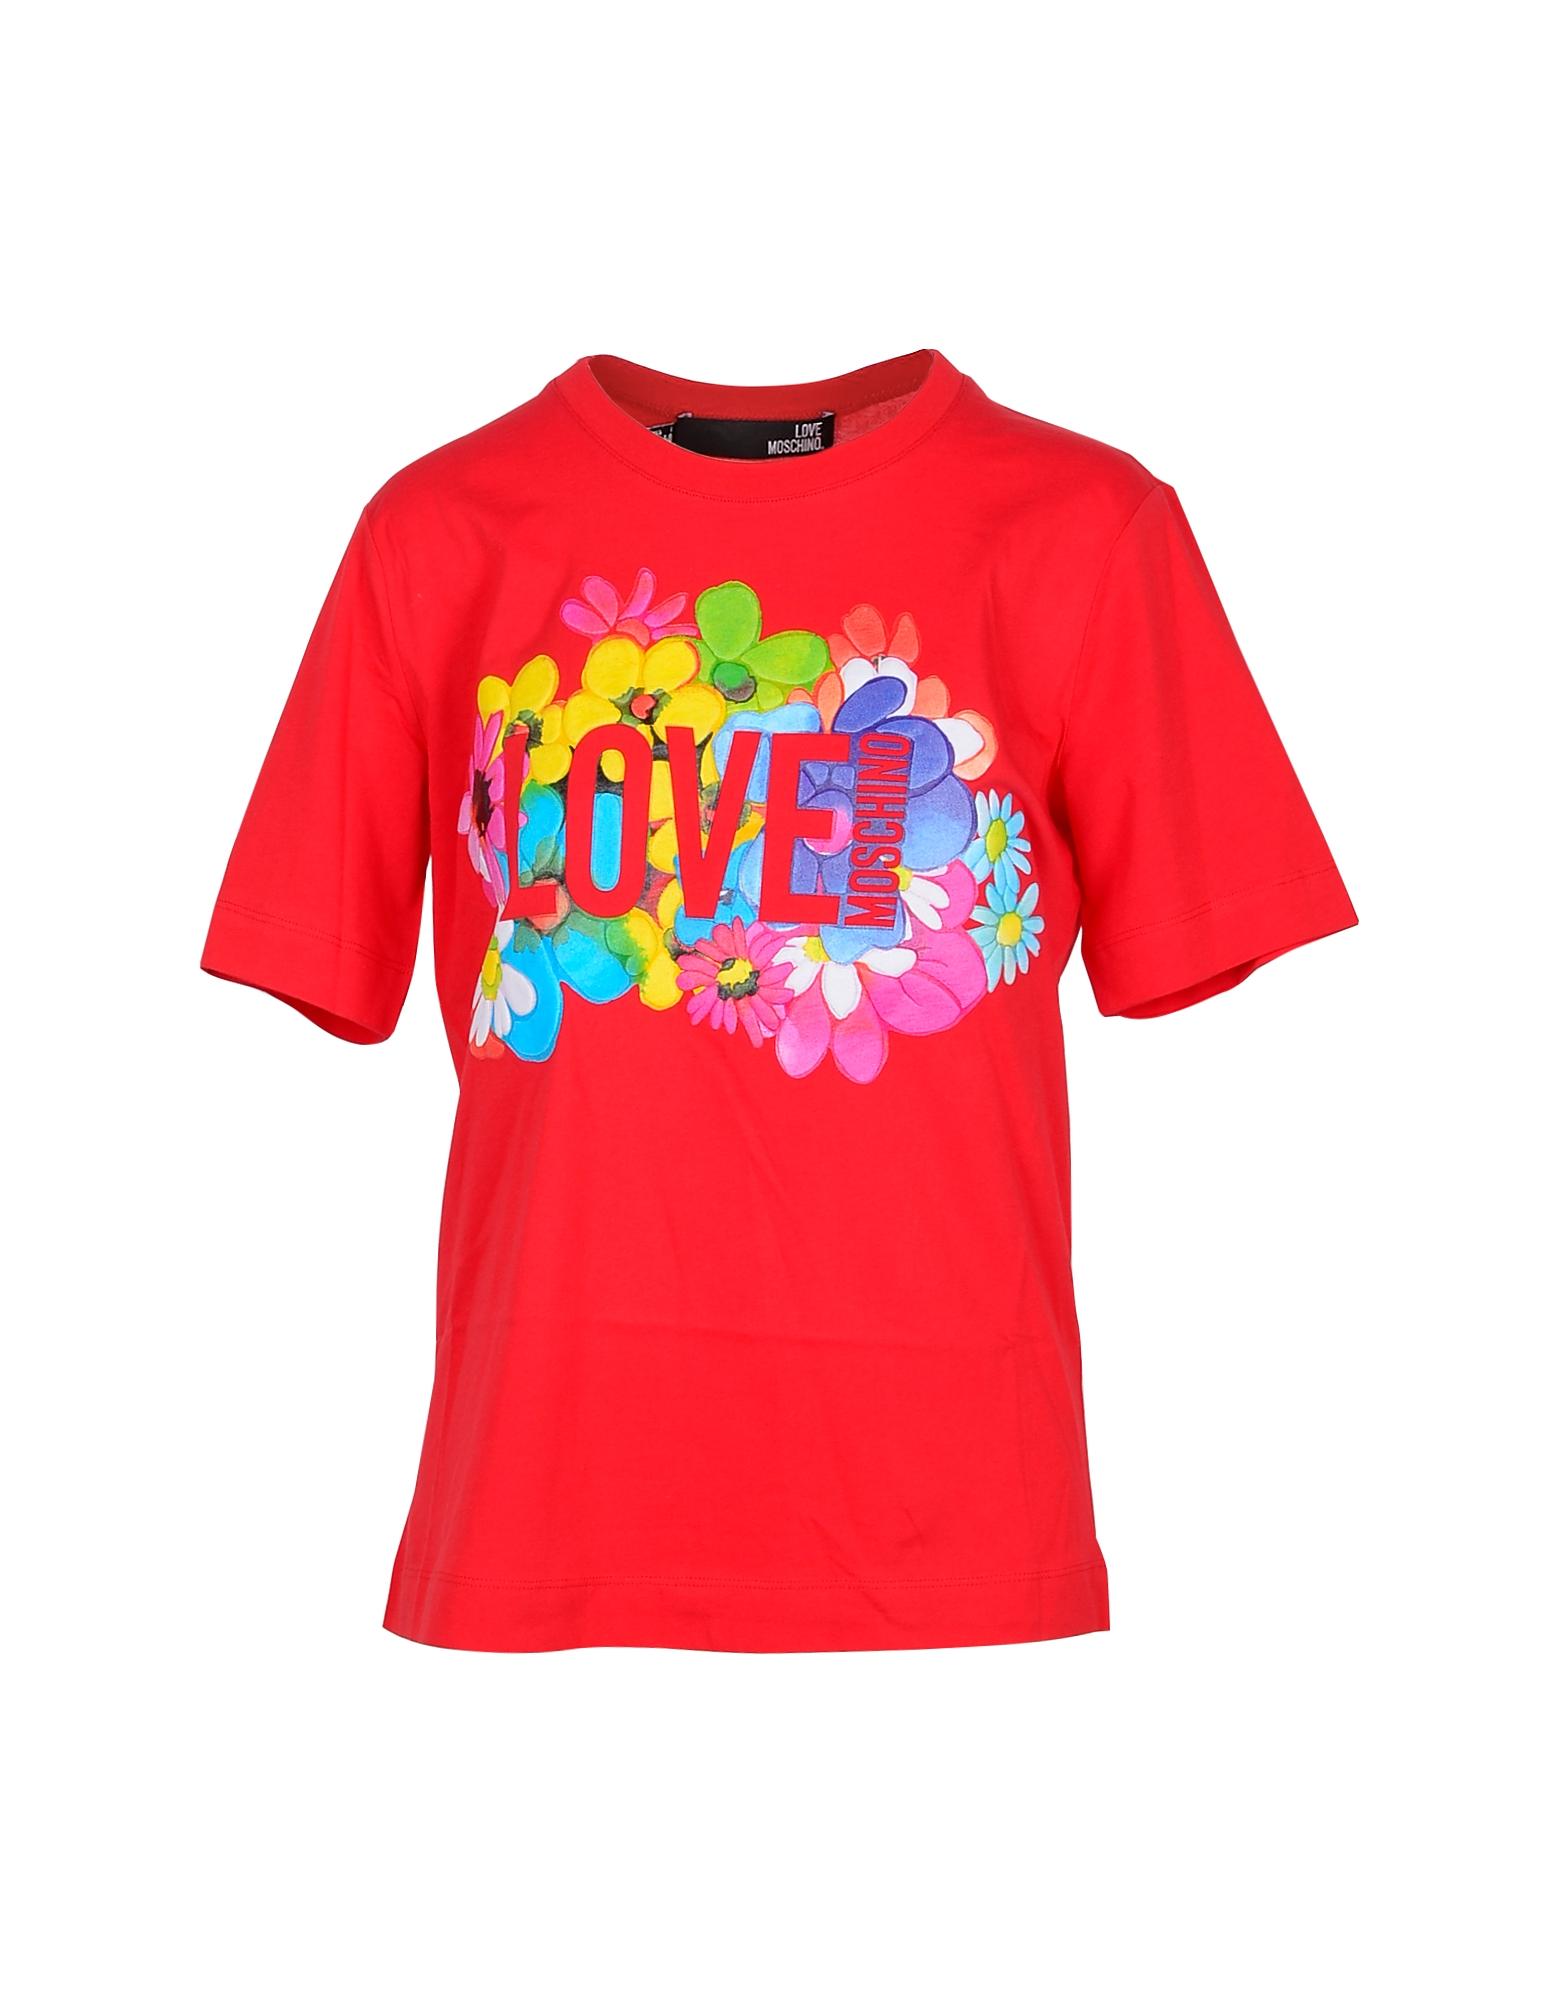 Love Moschino Designer T-Shirts & Tops, Flower Print Red Cotton Women's T-Shirt